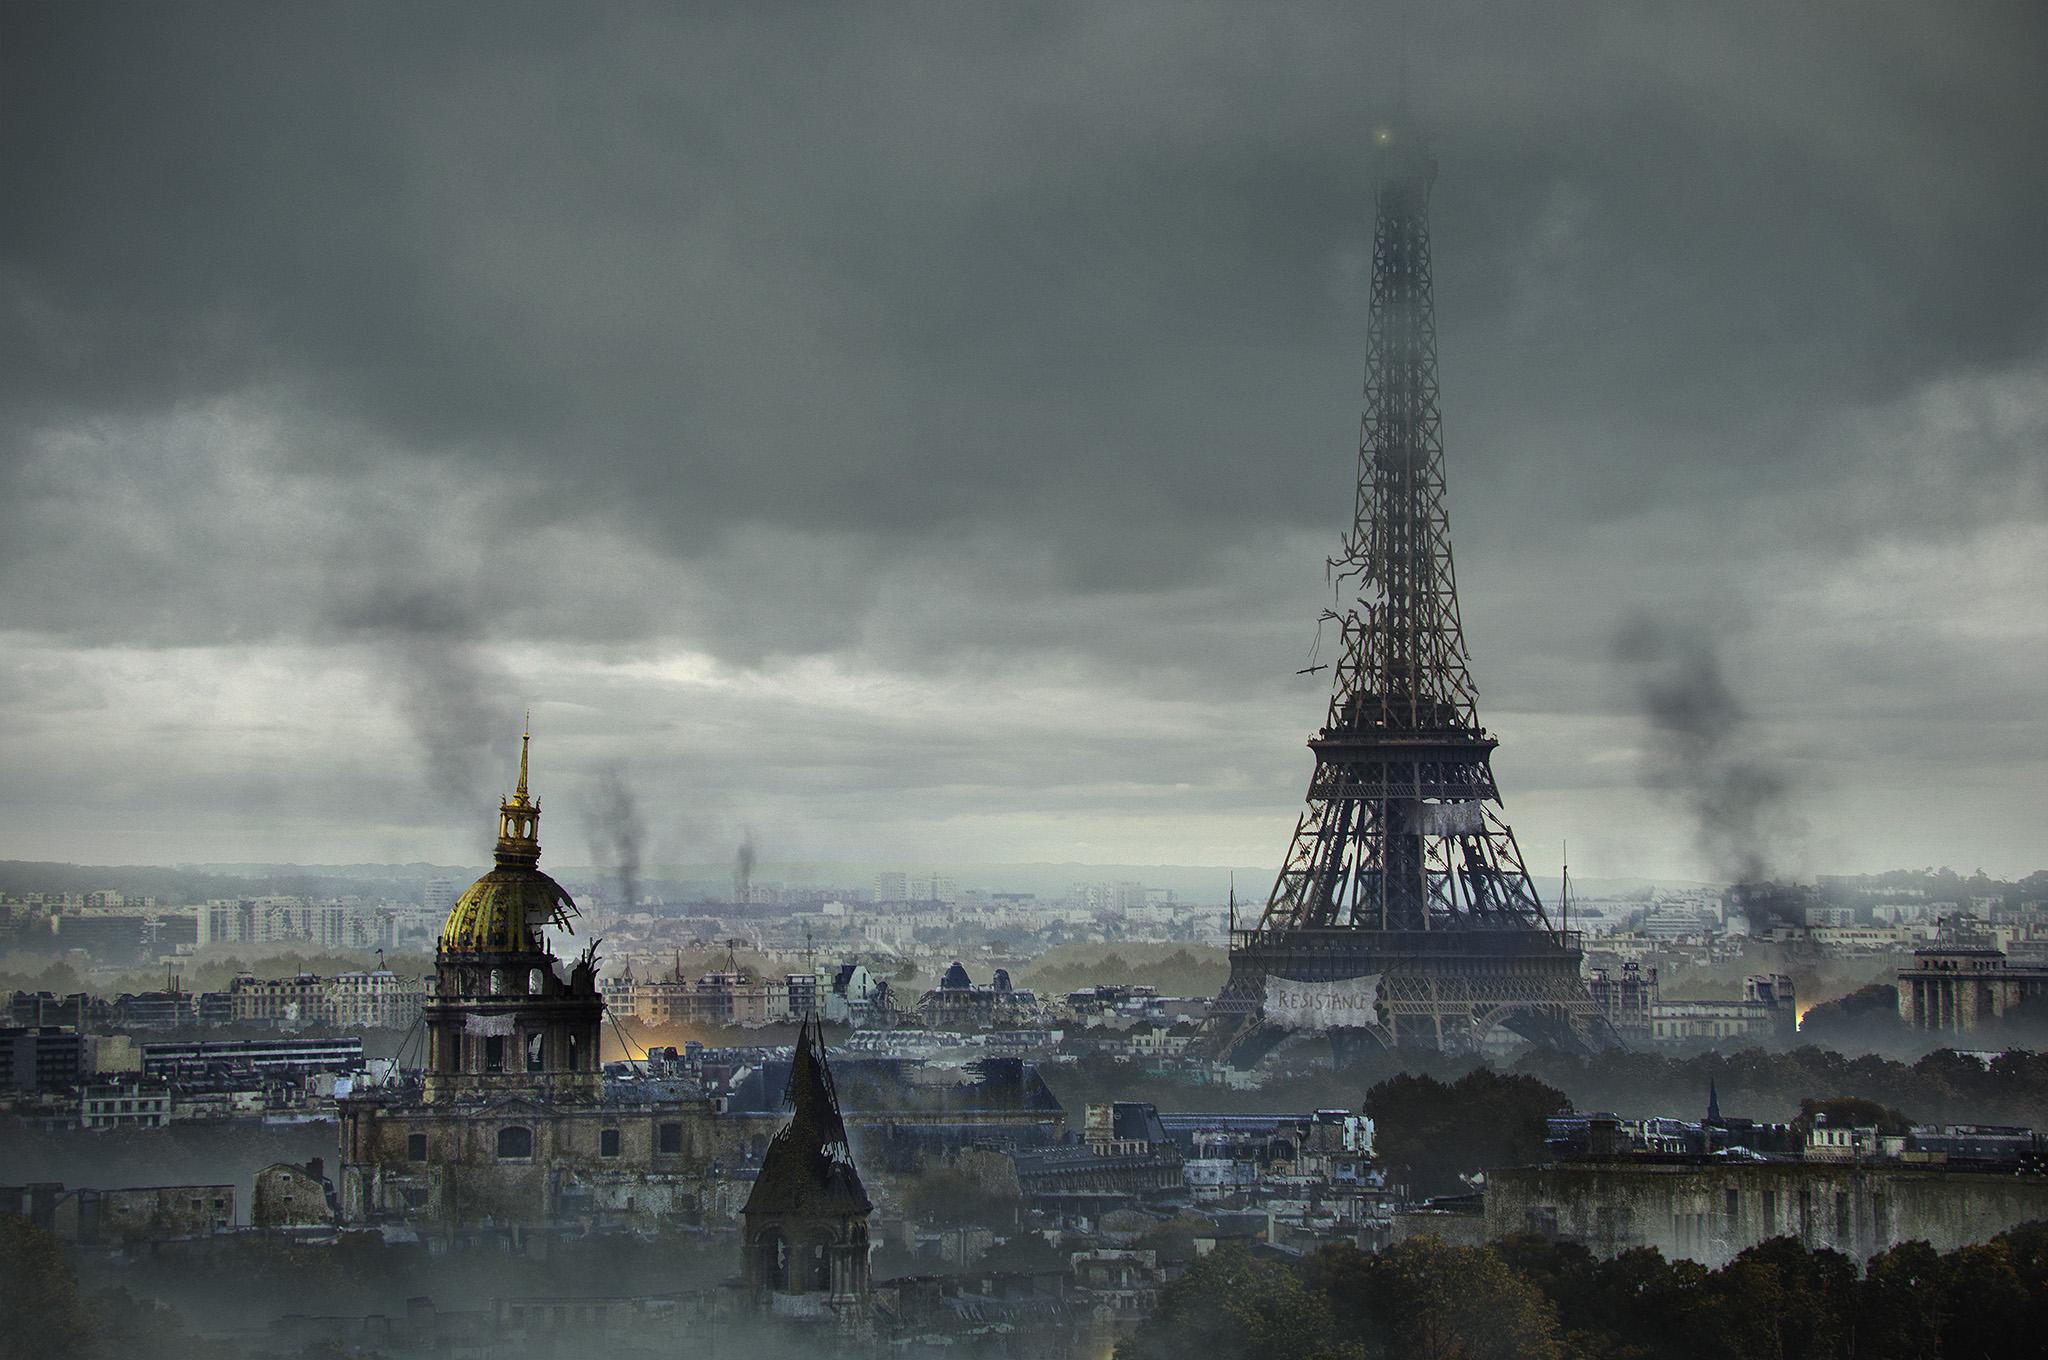 Post-Apocalyptic Eiffel Tower, France